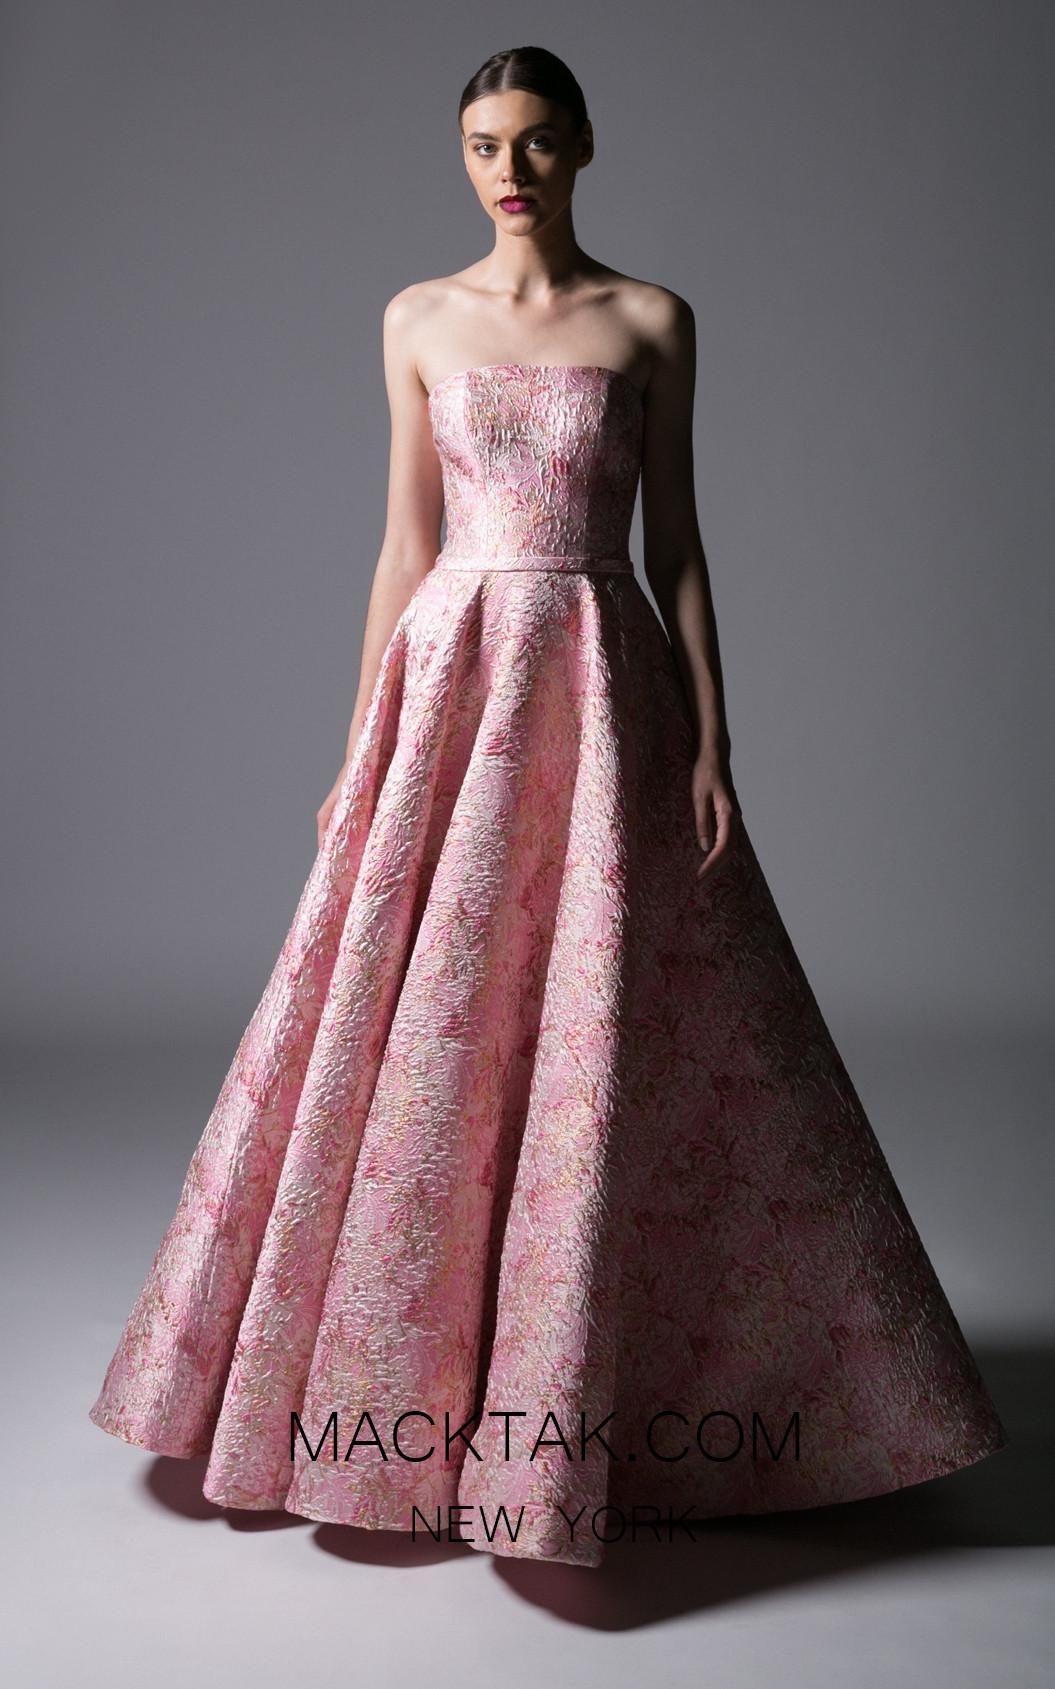 Edward Arsouni SS0345 Dress